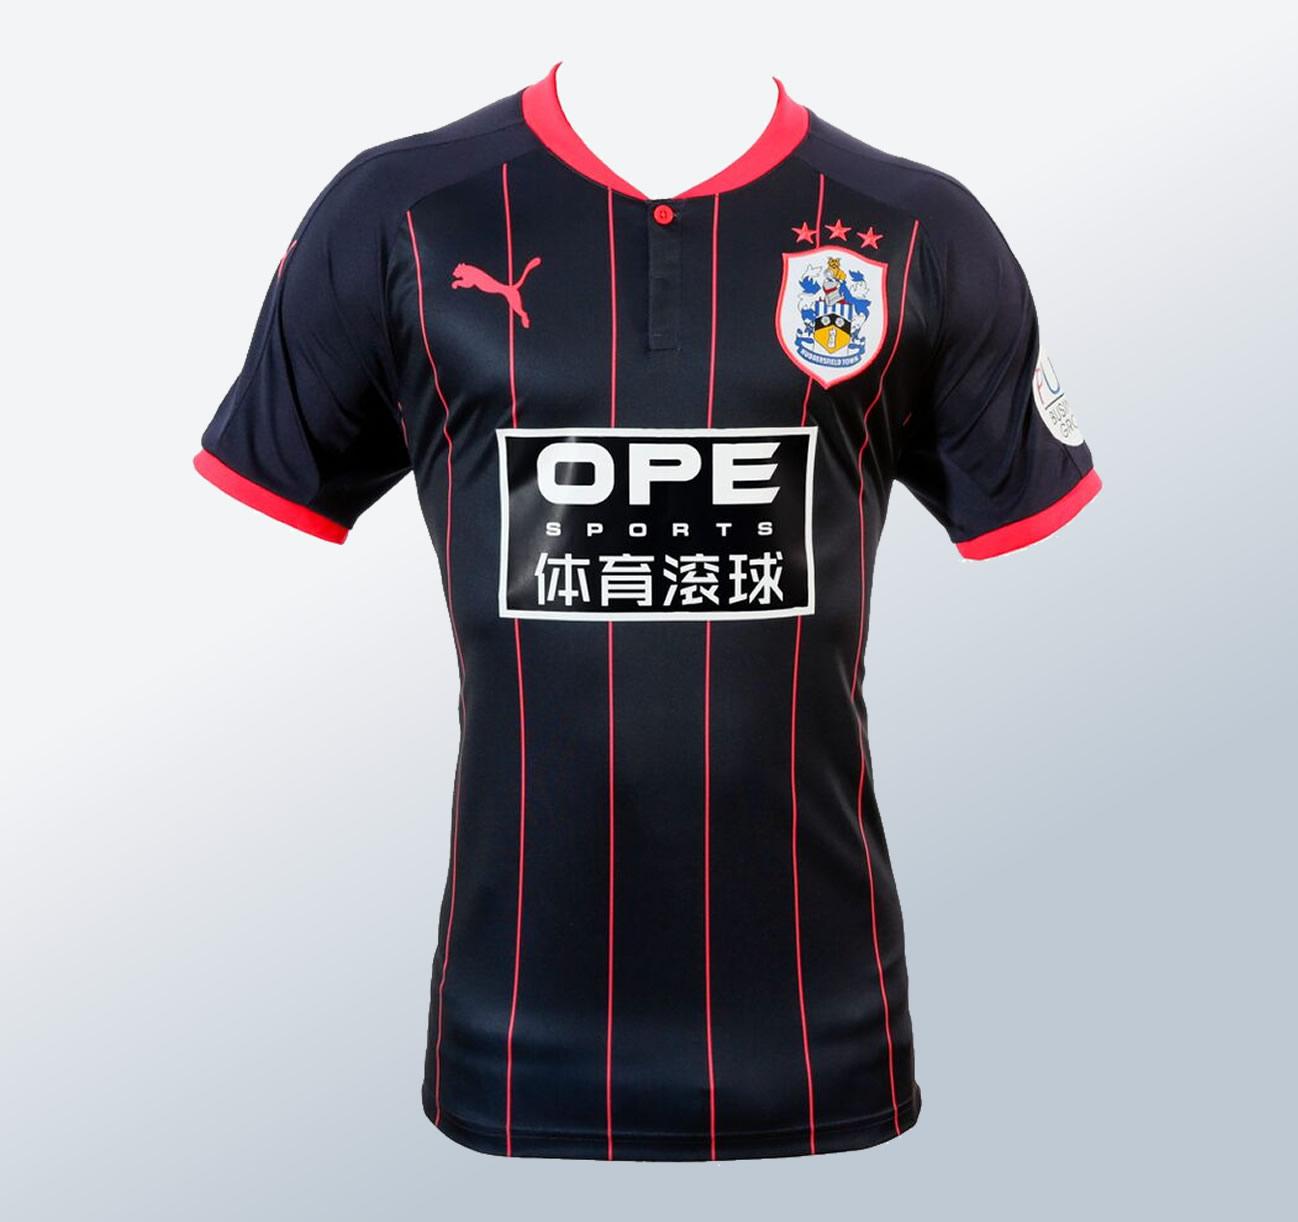 Nuevo kit alternativo del Huddersfield Town | Foto Twitter Oficial